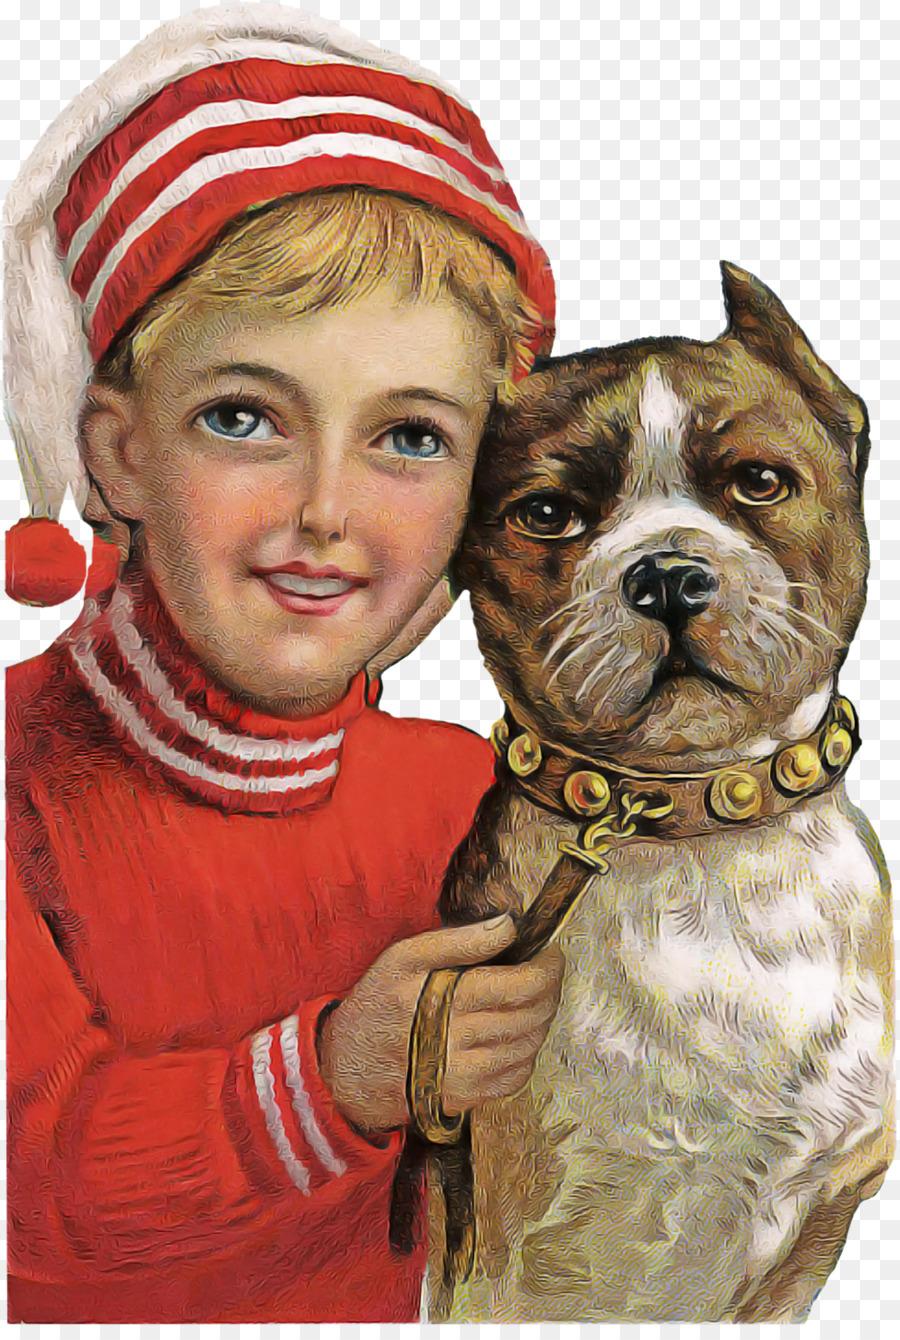 Descarga gratuita de Perro, Bulldog, American Pit Bull Terrier imágenes PNG